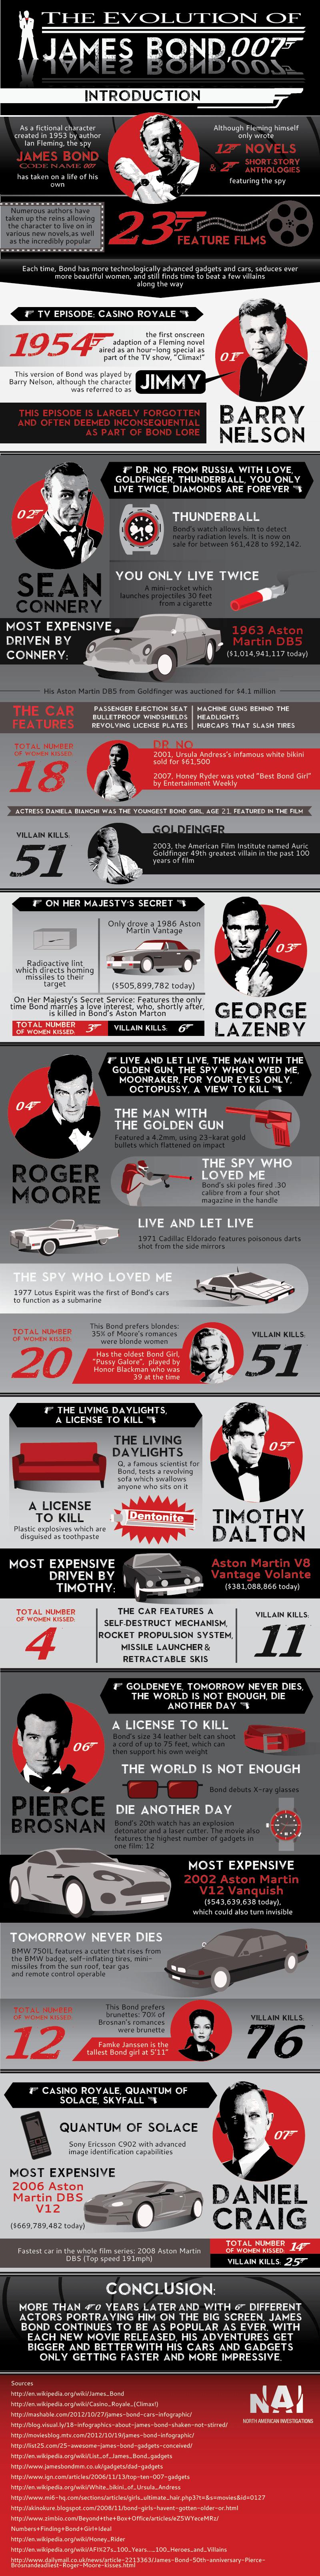 The Evolution Of James Bond